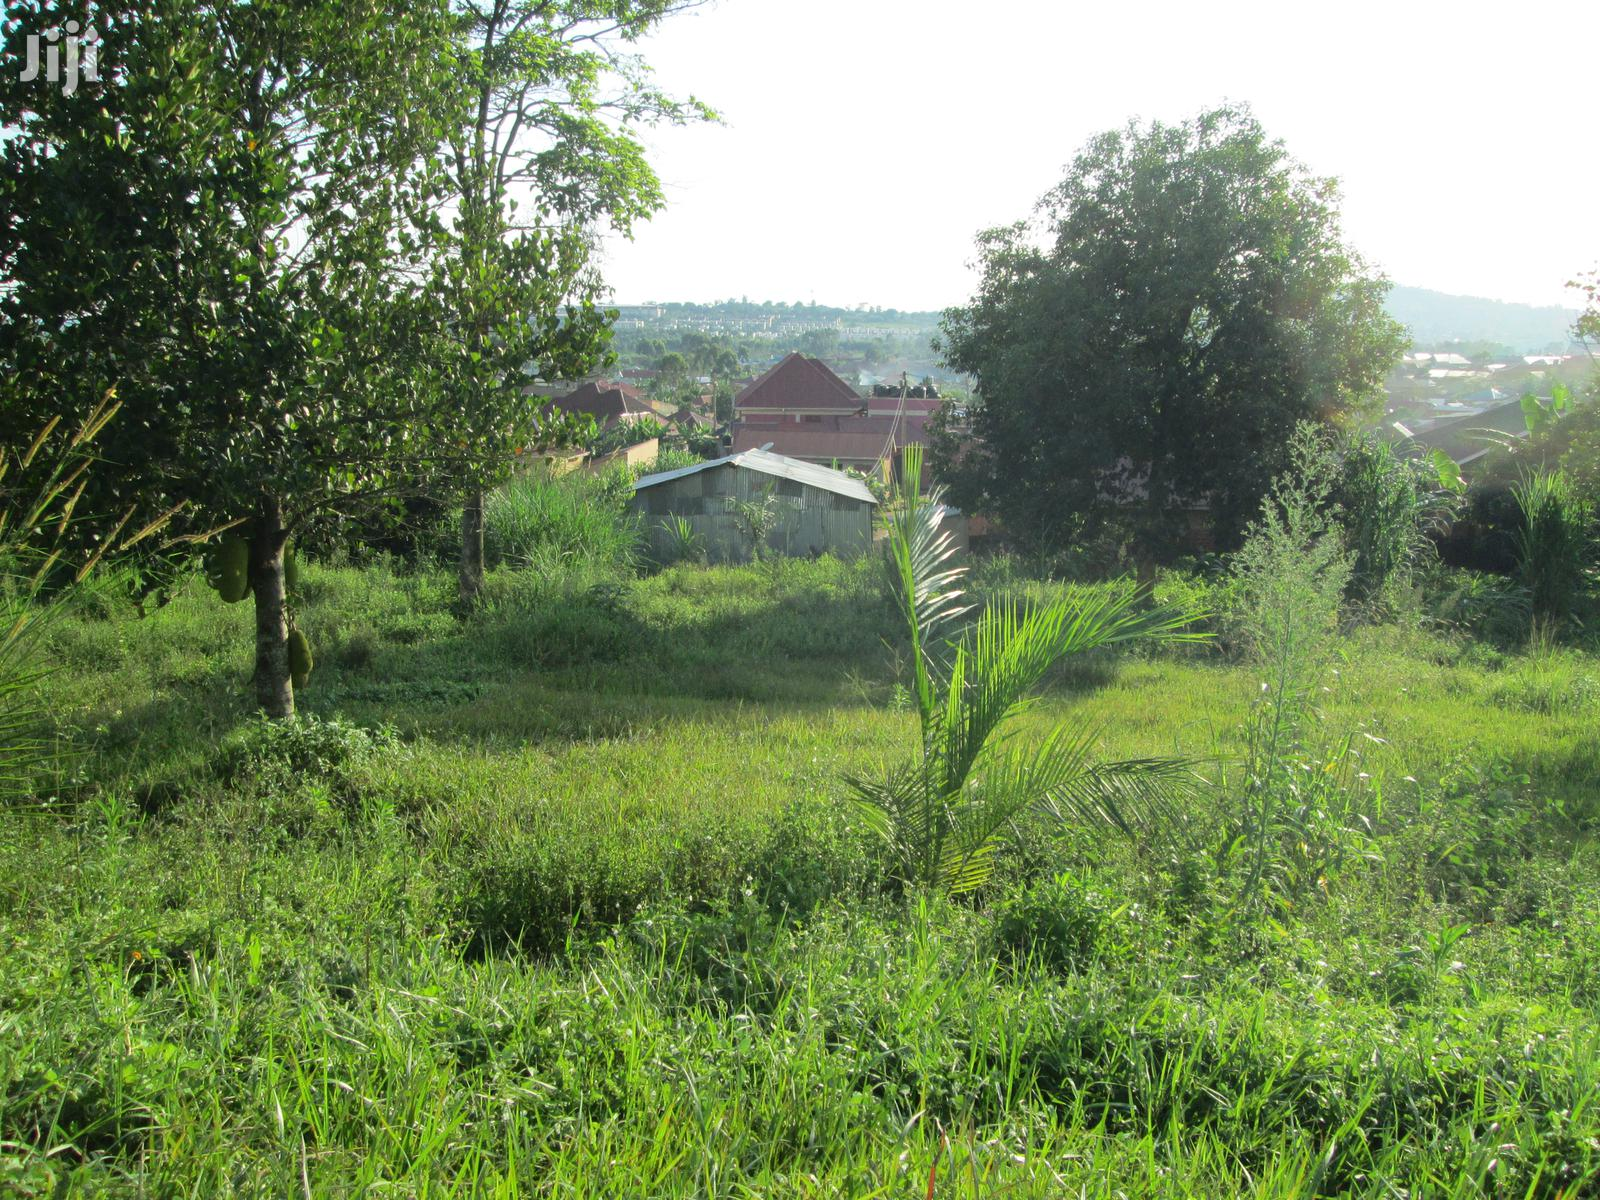 Land In Kirinya Along Bukasa Road For Sale | Land & Plots For Sale for sale in Kampala, Central Region, Uganda